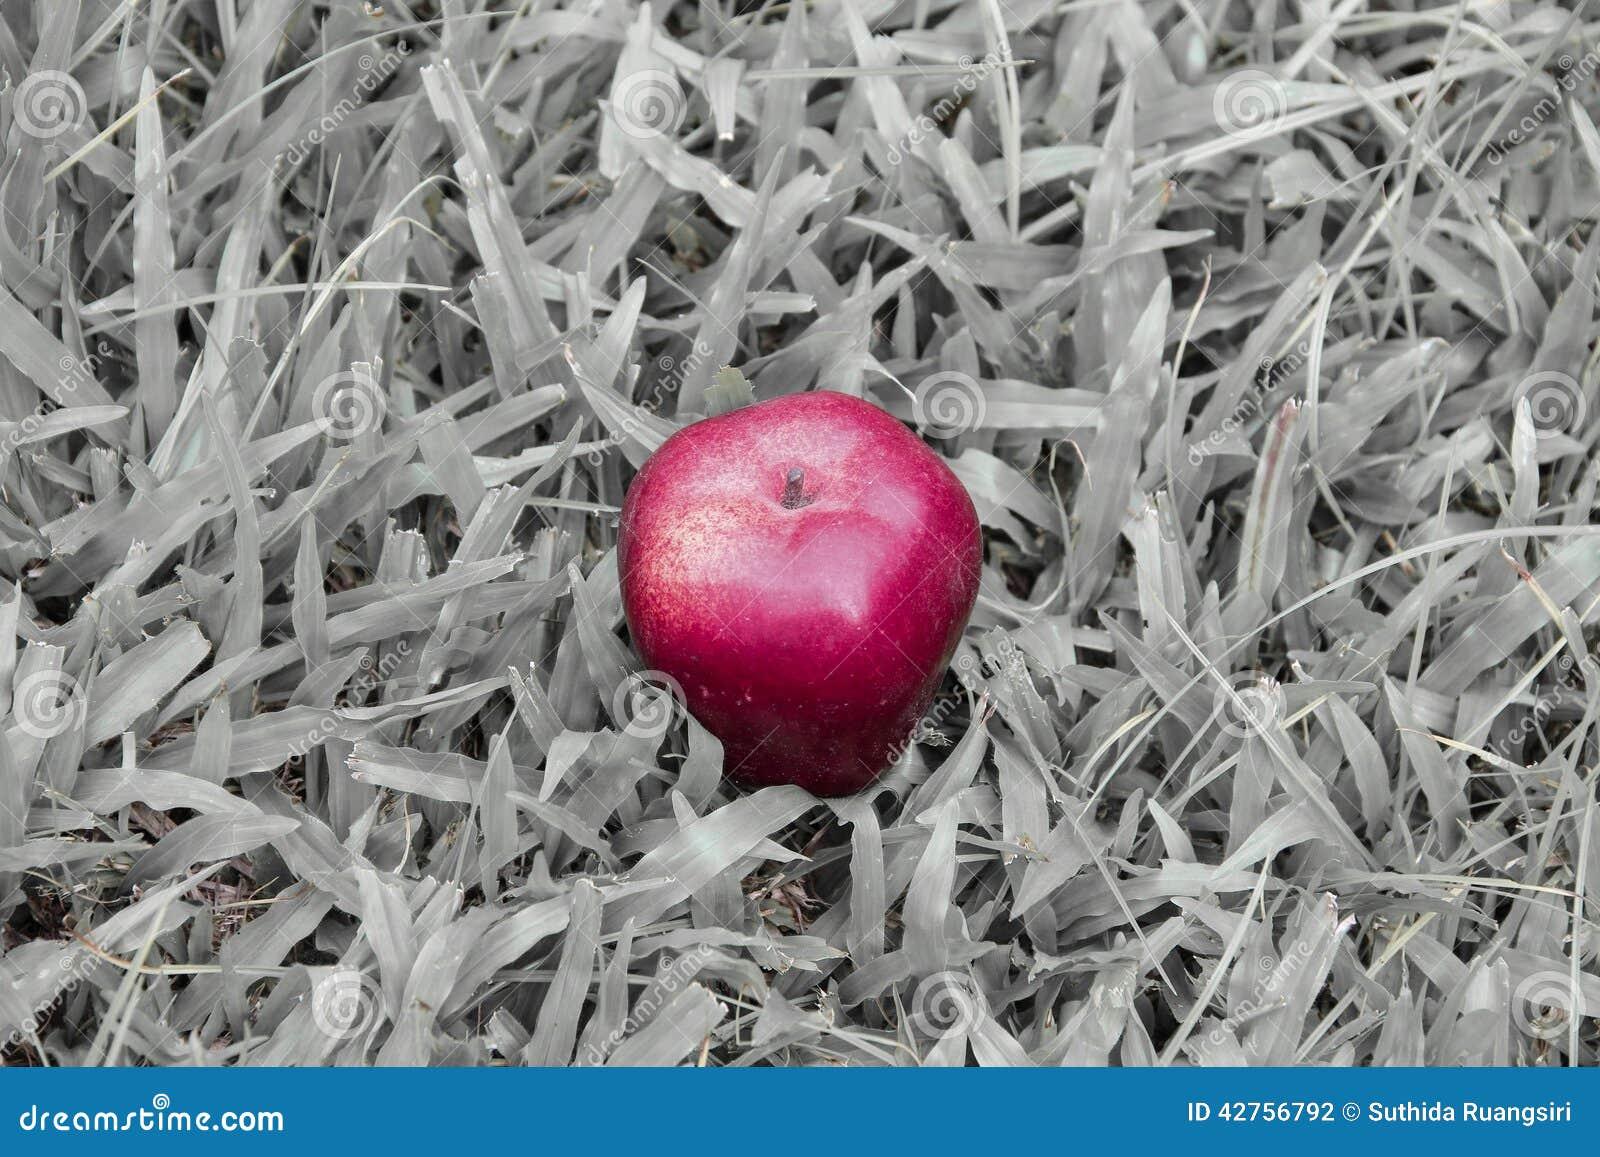 apple fruit background grass - photo #42